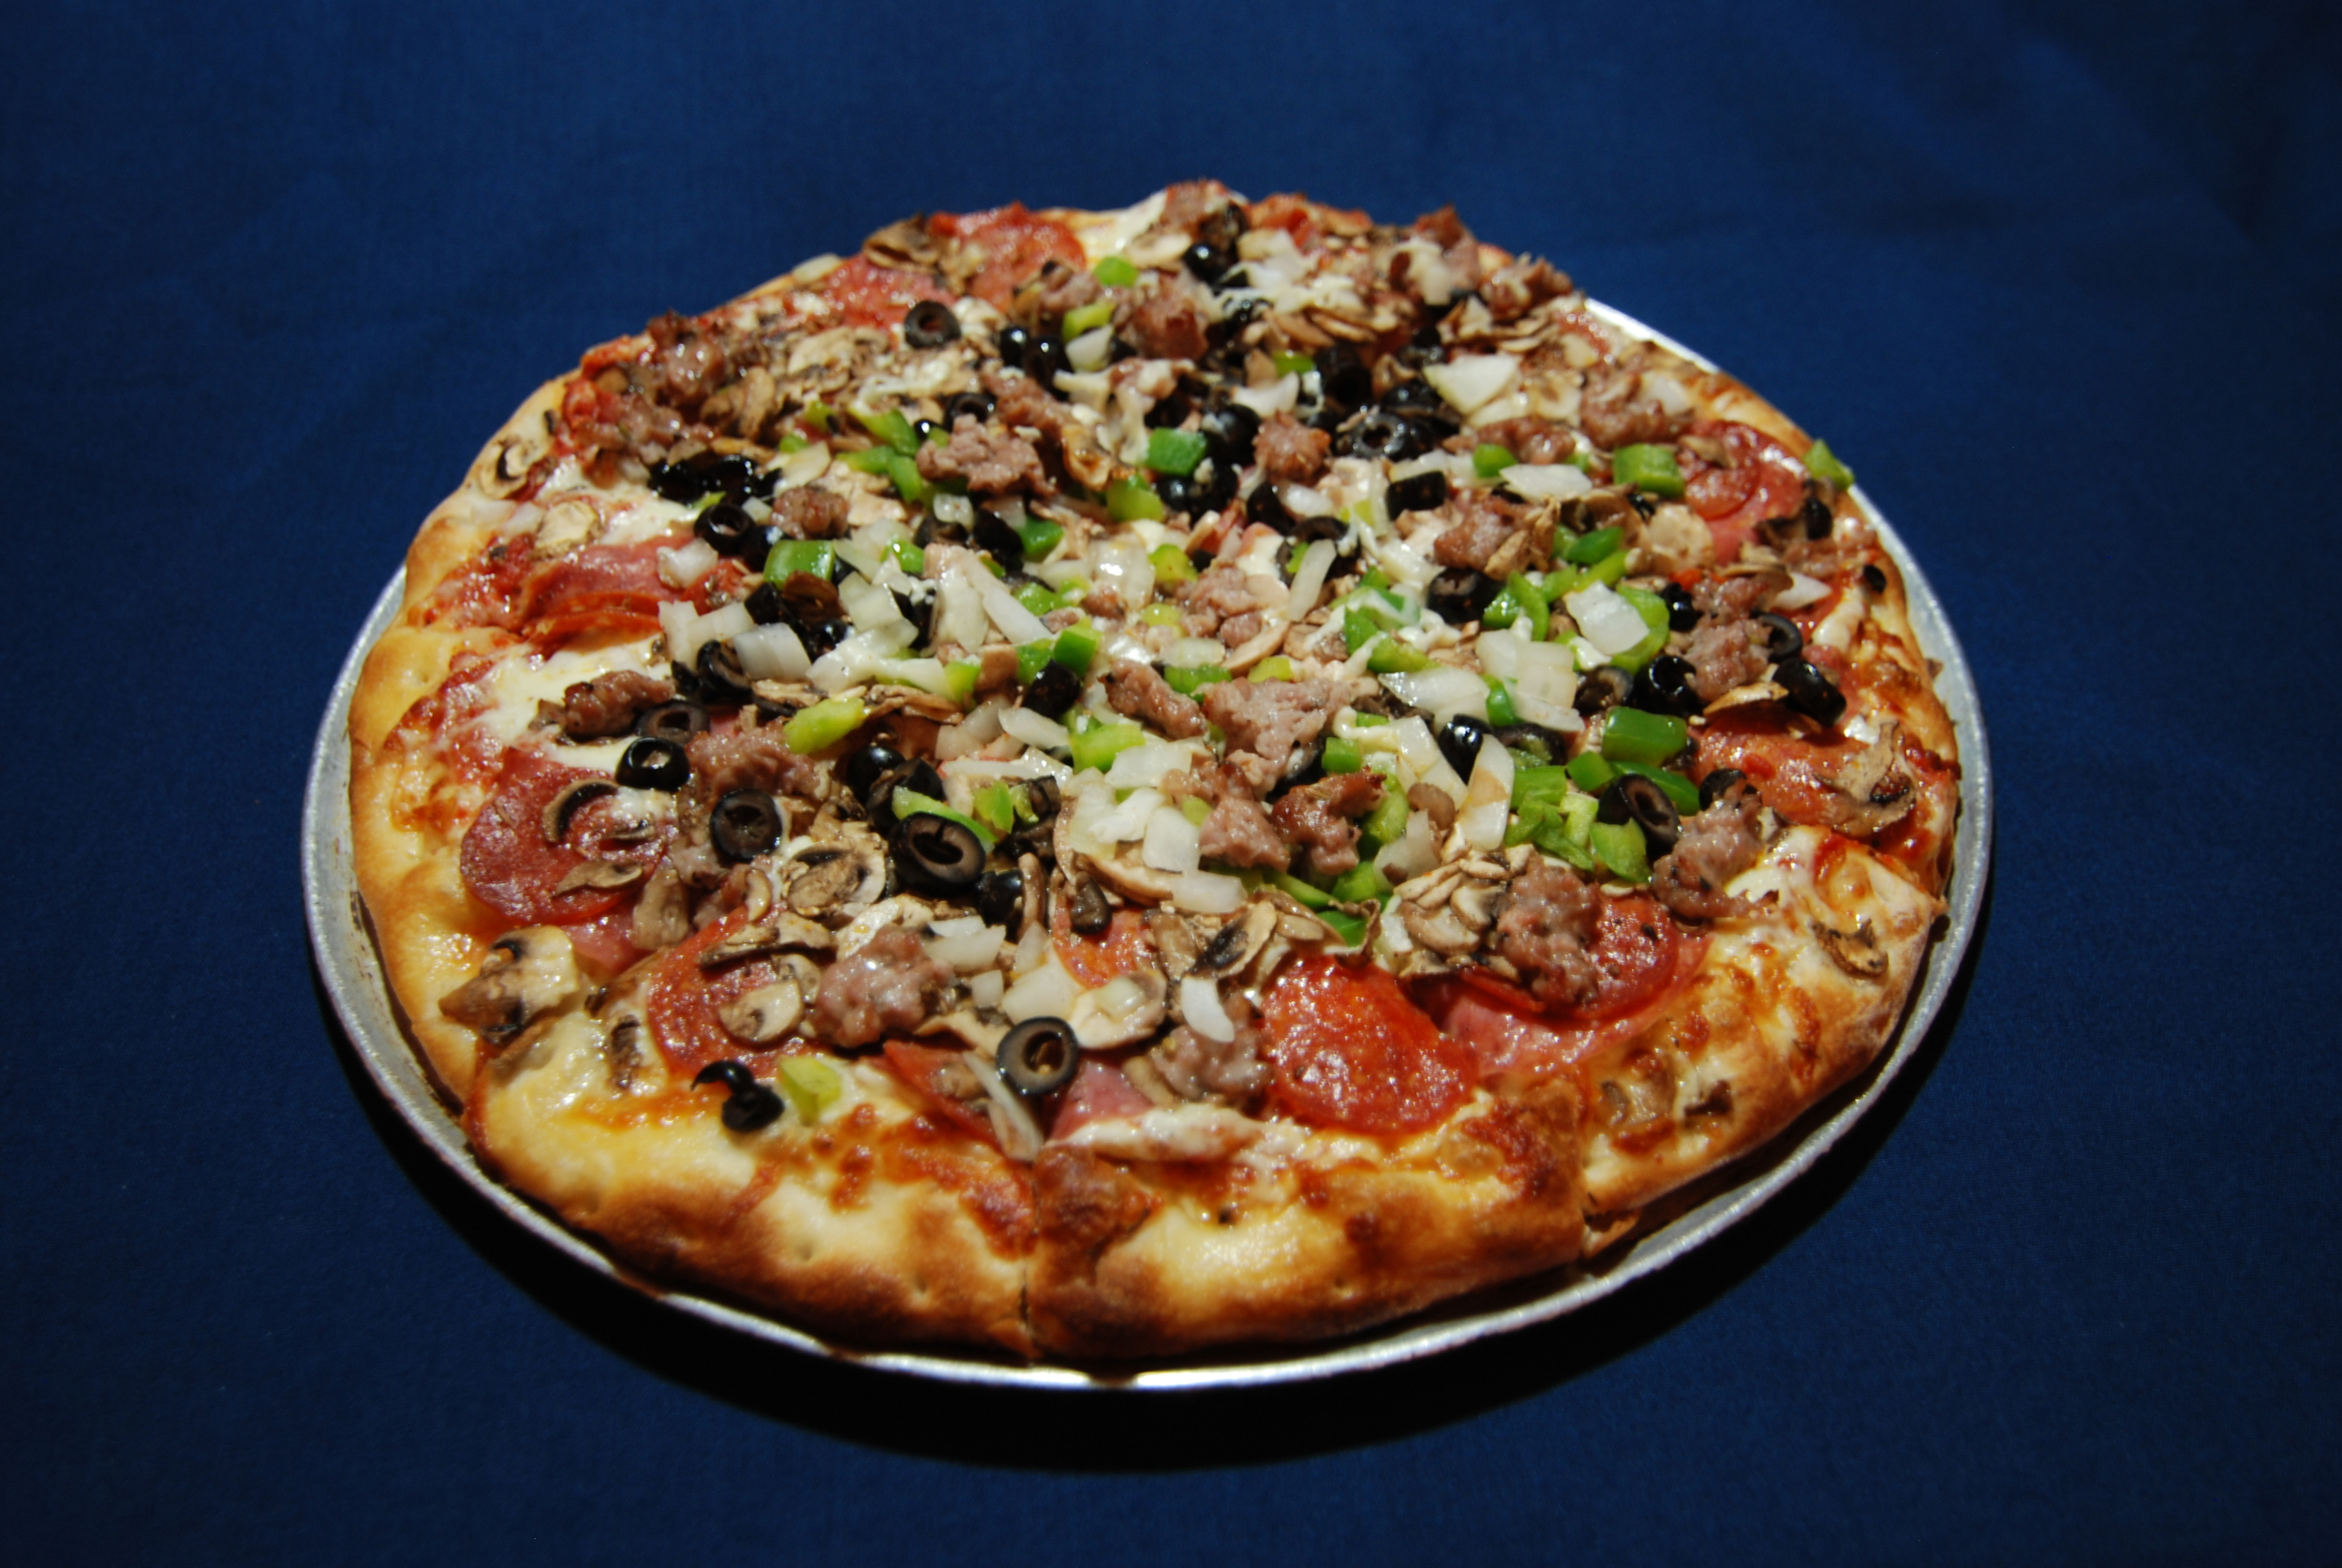 Bummer's Favorite Pizza